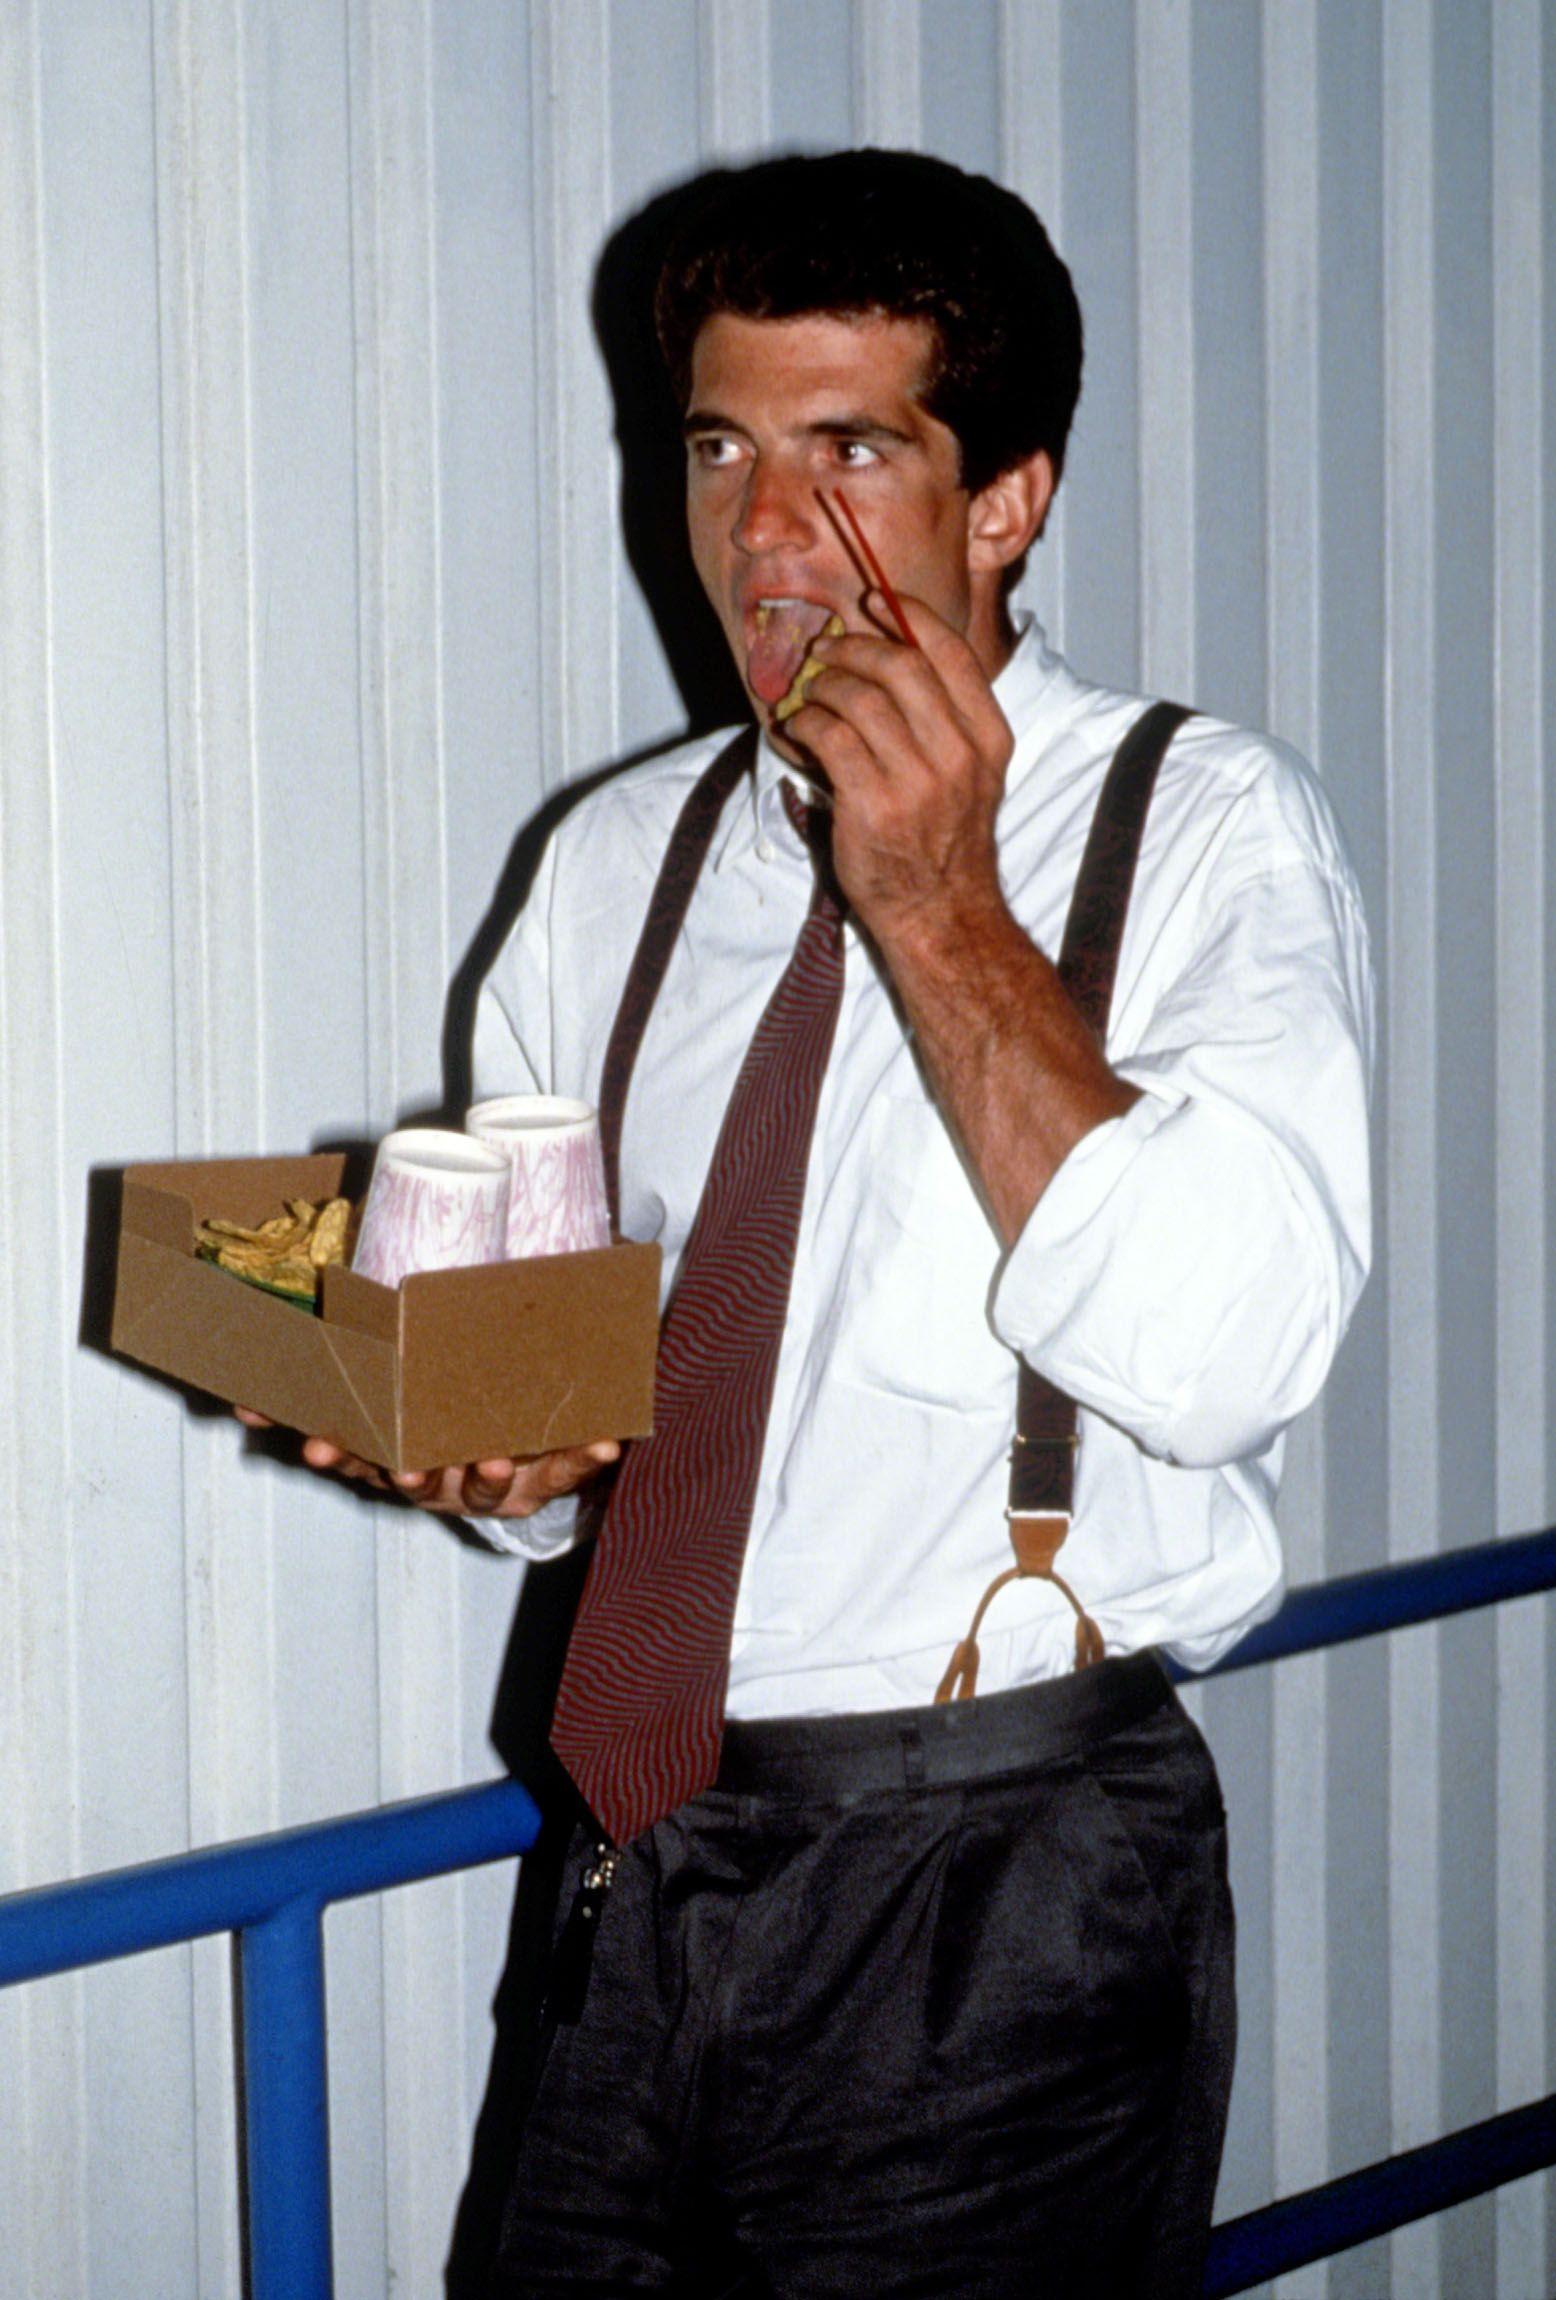 John F. Kennedy Jr. attends the 1991 U.S. Open Tennis Tournament  in Flushing, Queens.